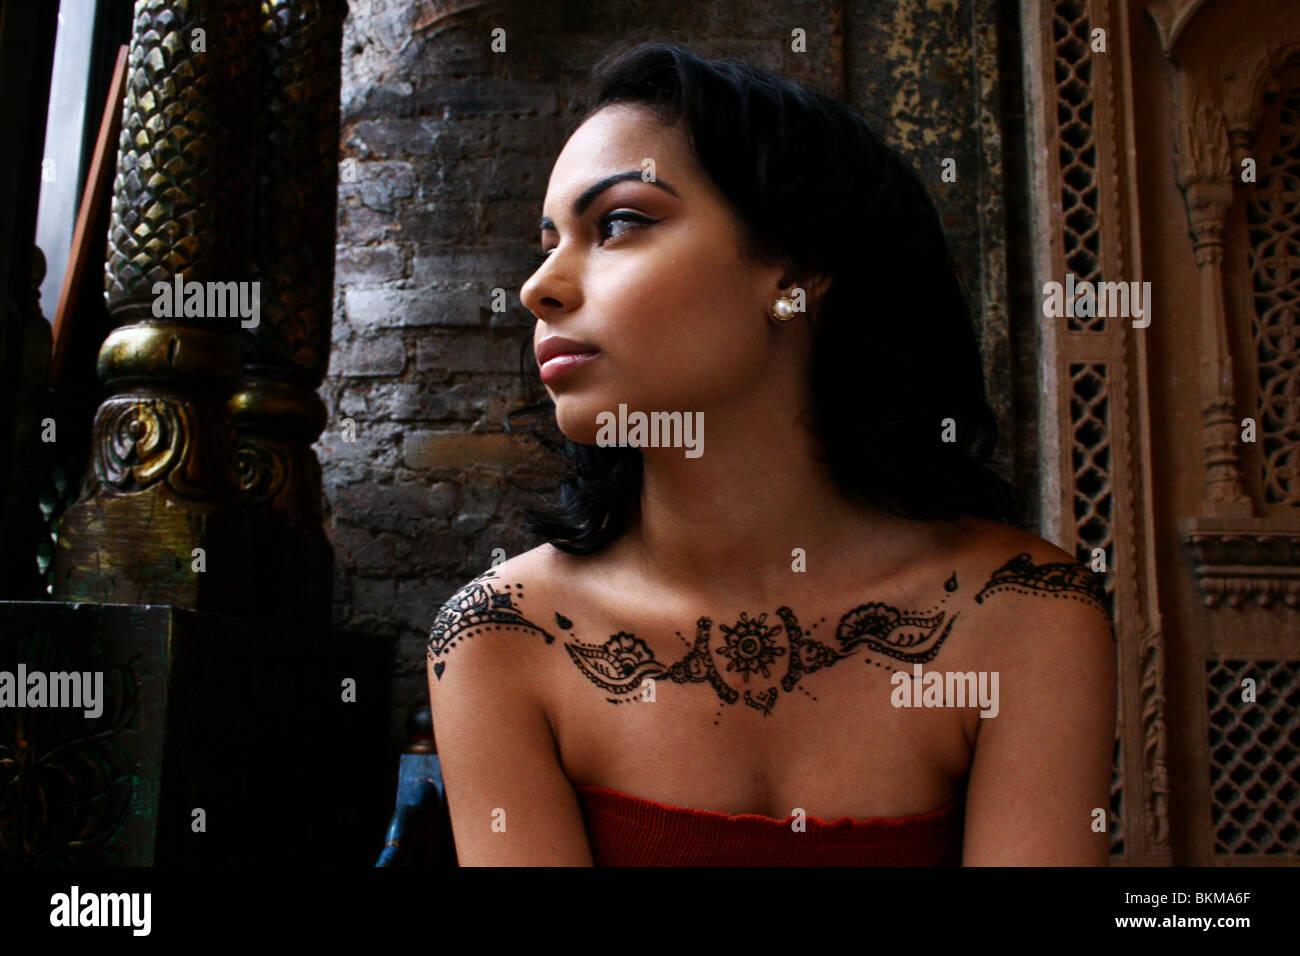 Retrato de mujer pintado con moderno diseño de henna sobre sus hombros. Imagen De Stock